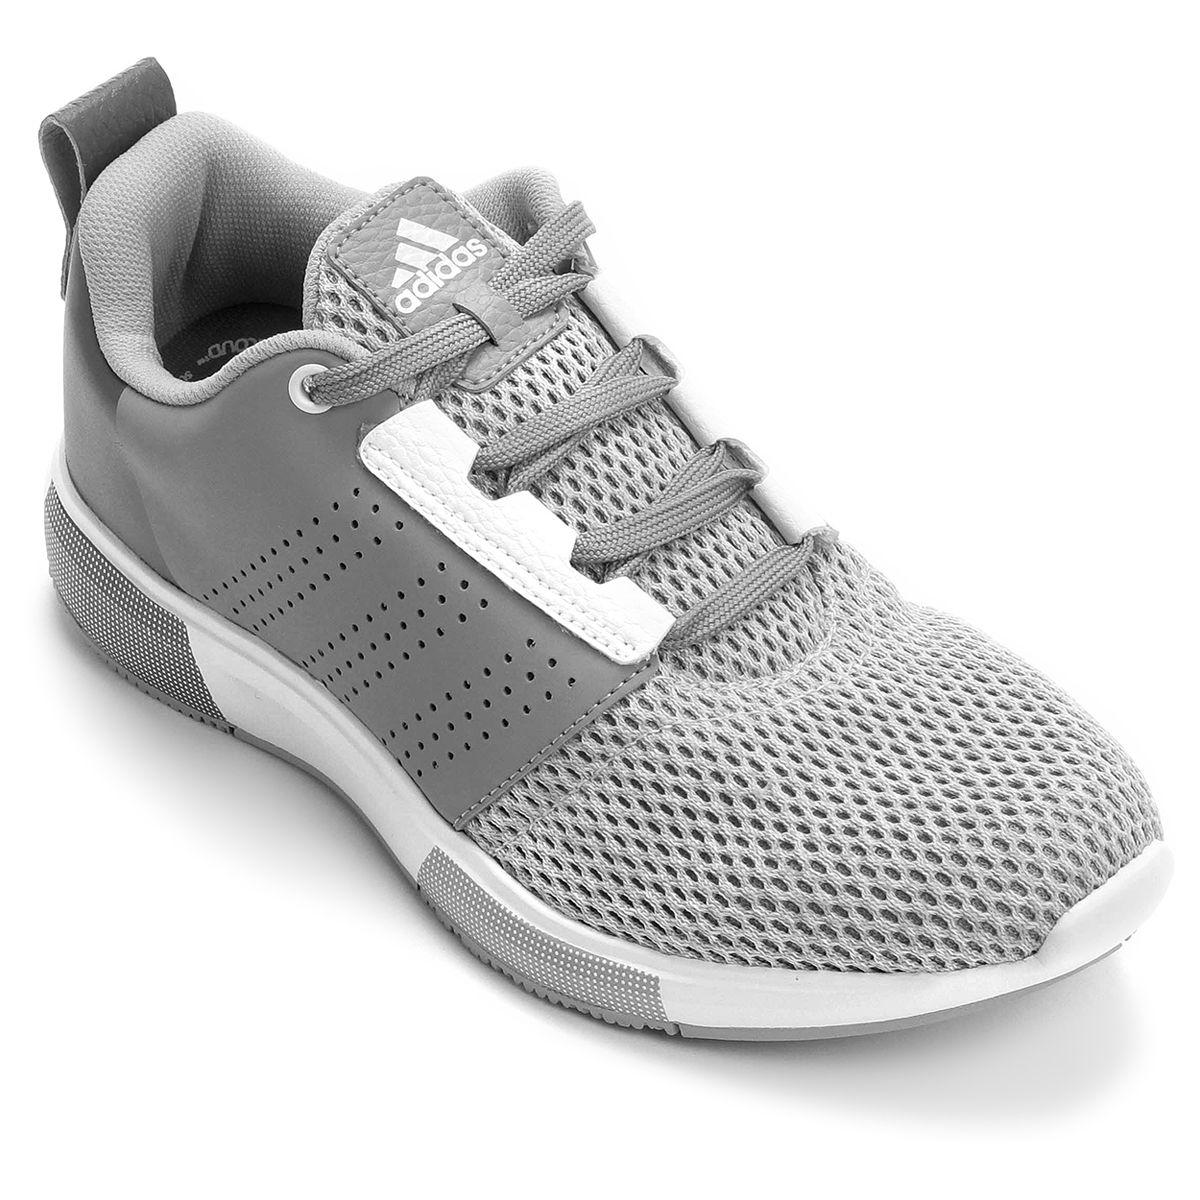 54890f1301 Tênis Adidas Madoru 2 Cinza e Branco